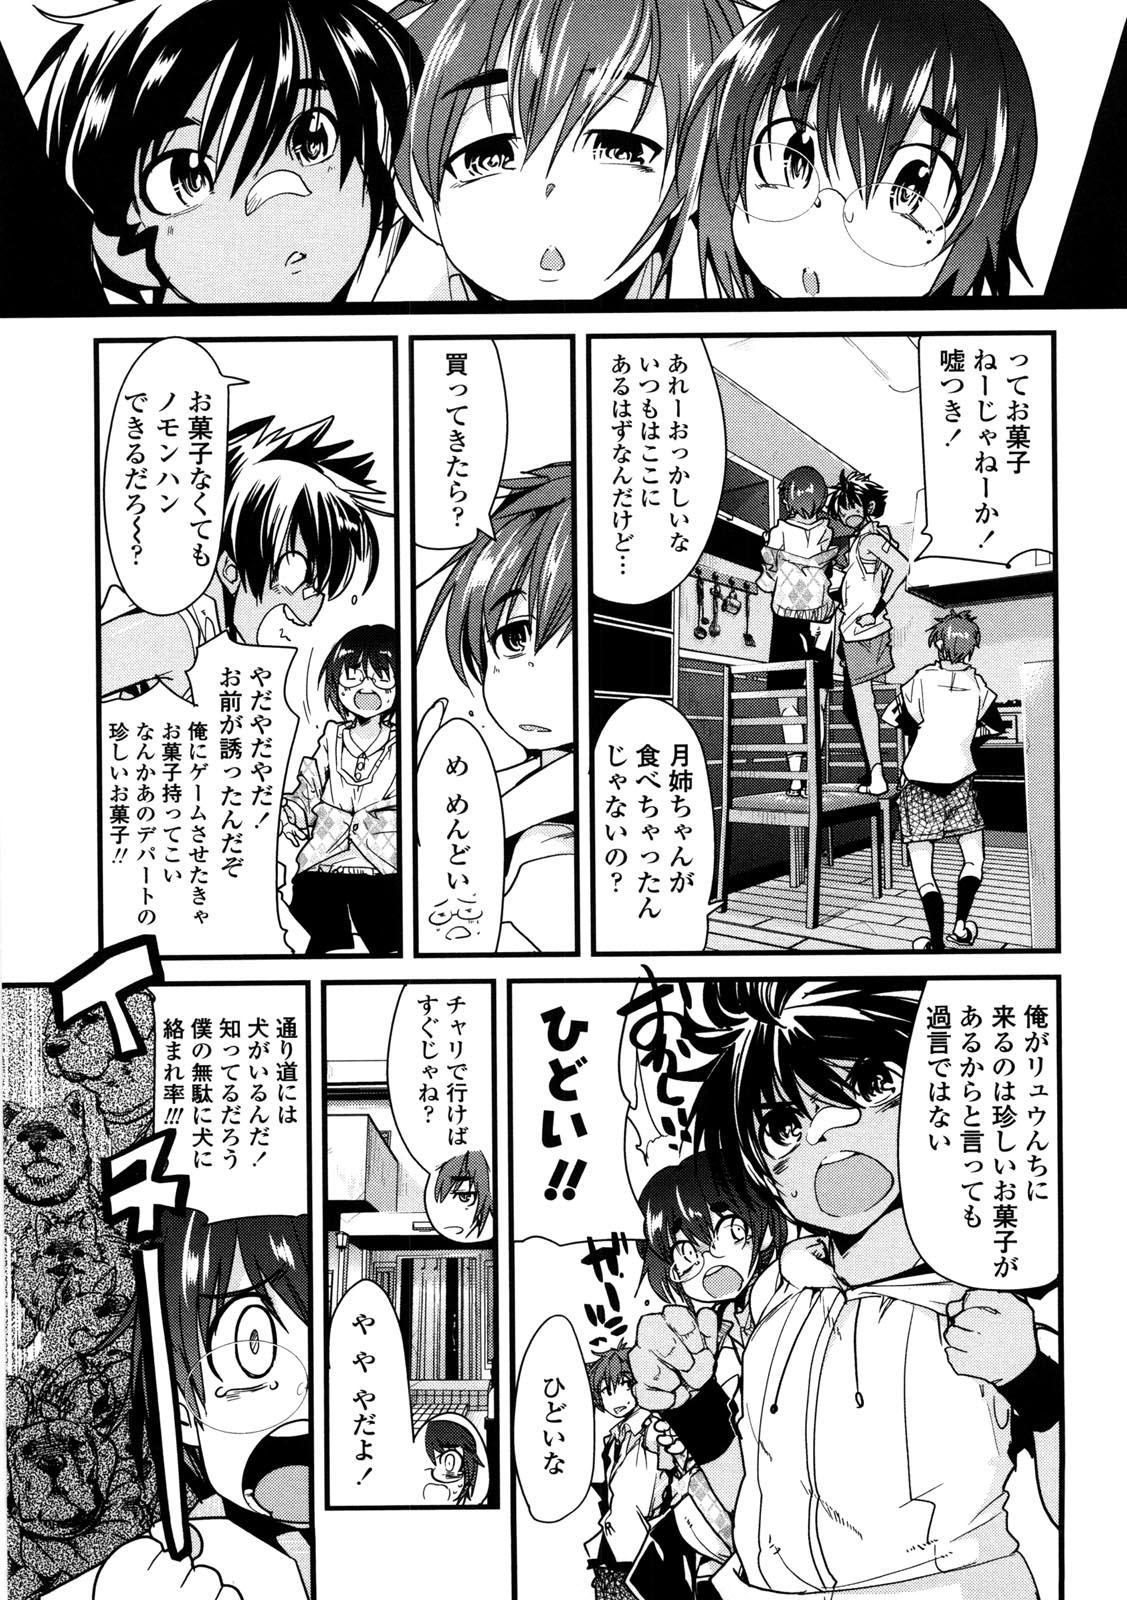 One Shota One! 11